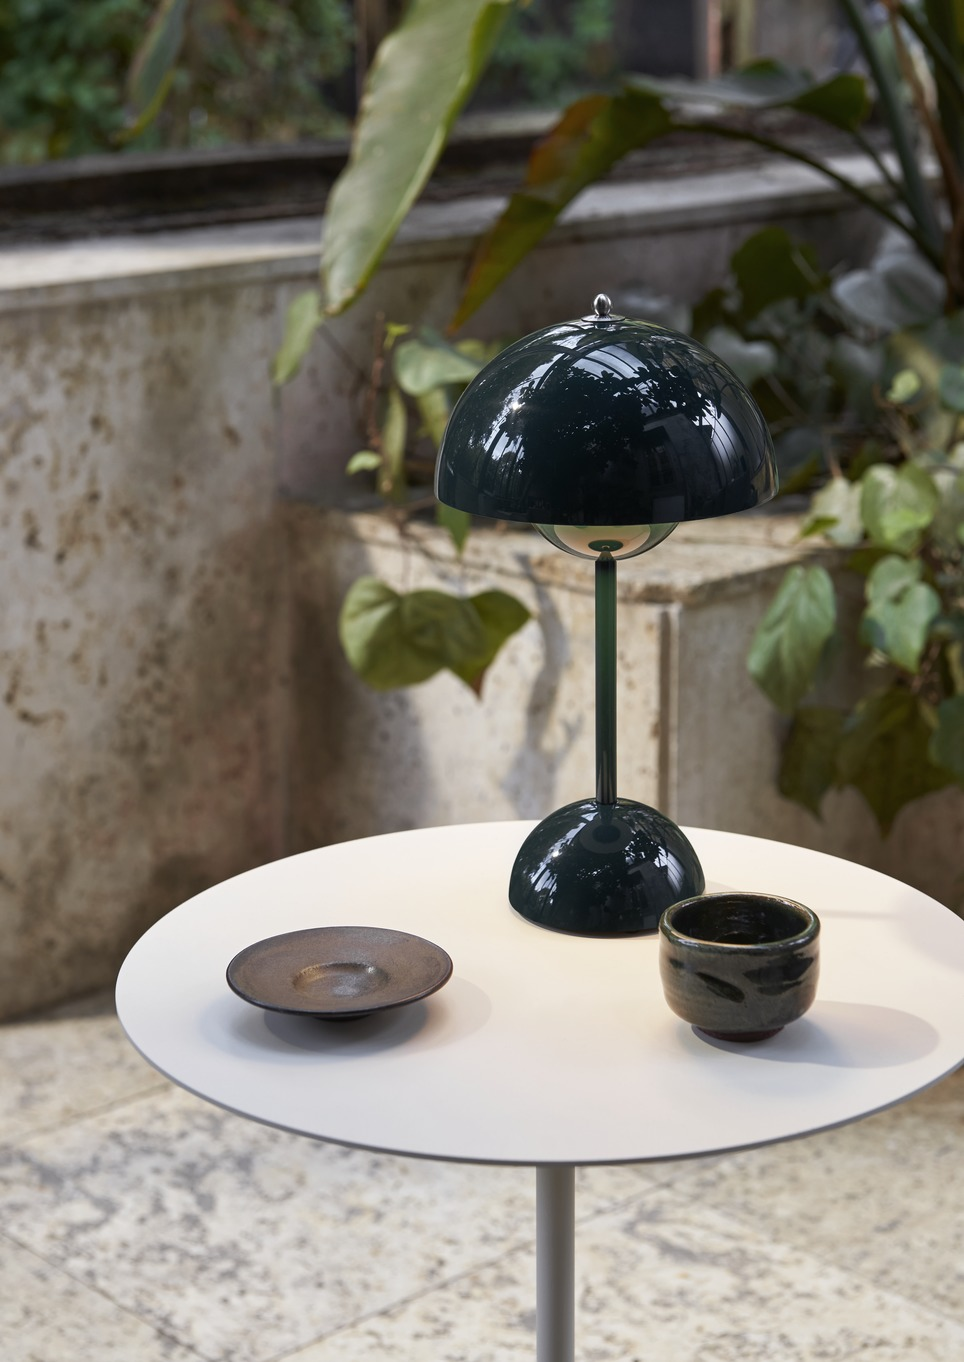 &Tradition Flowerpot Portable VP9 Dark Green